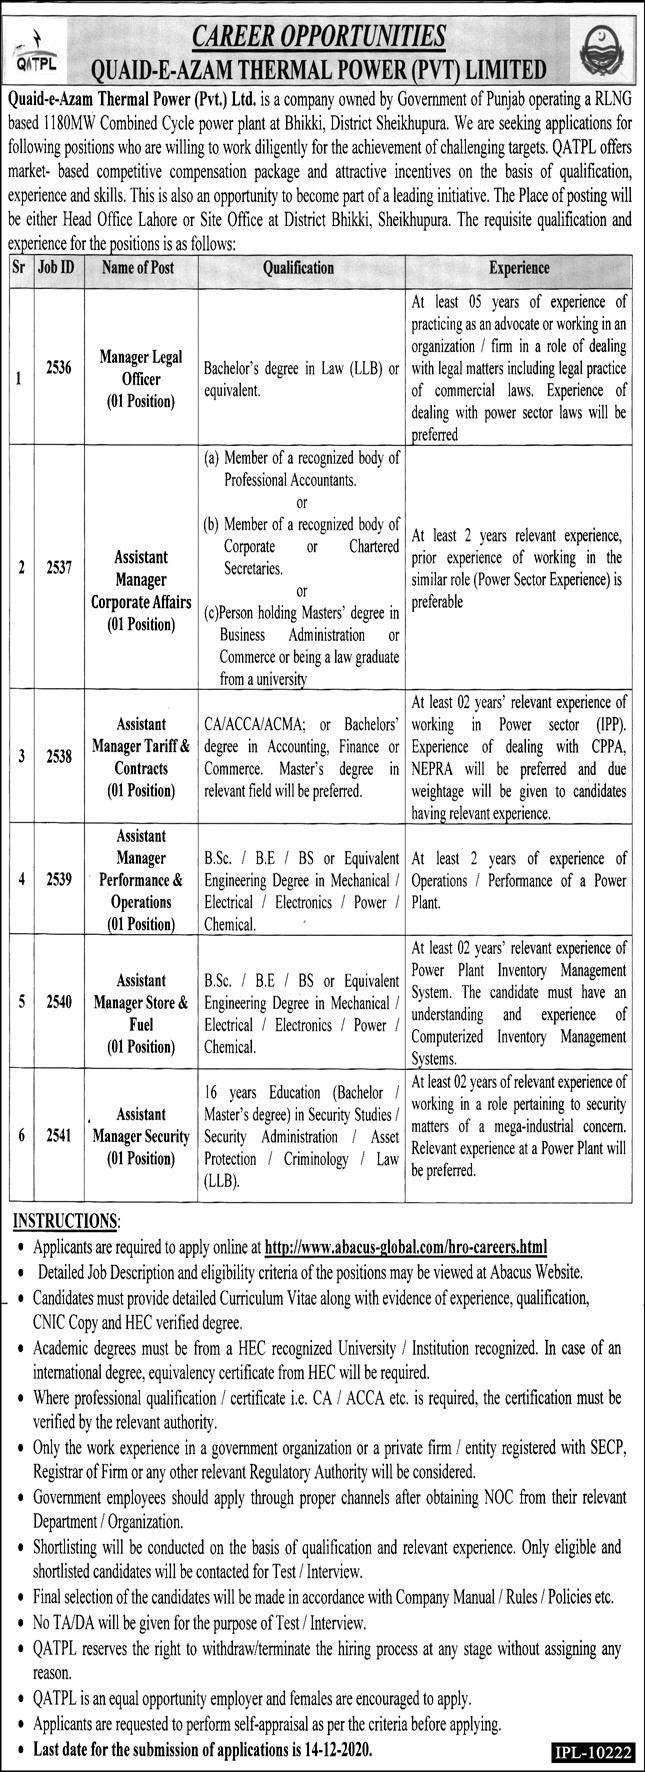 Latest Quaid-e-Azam Thermal Power Jobs